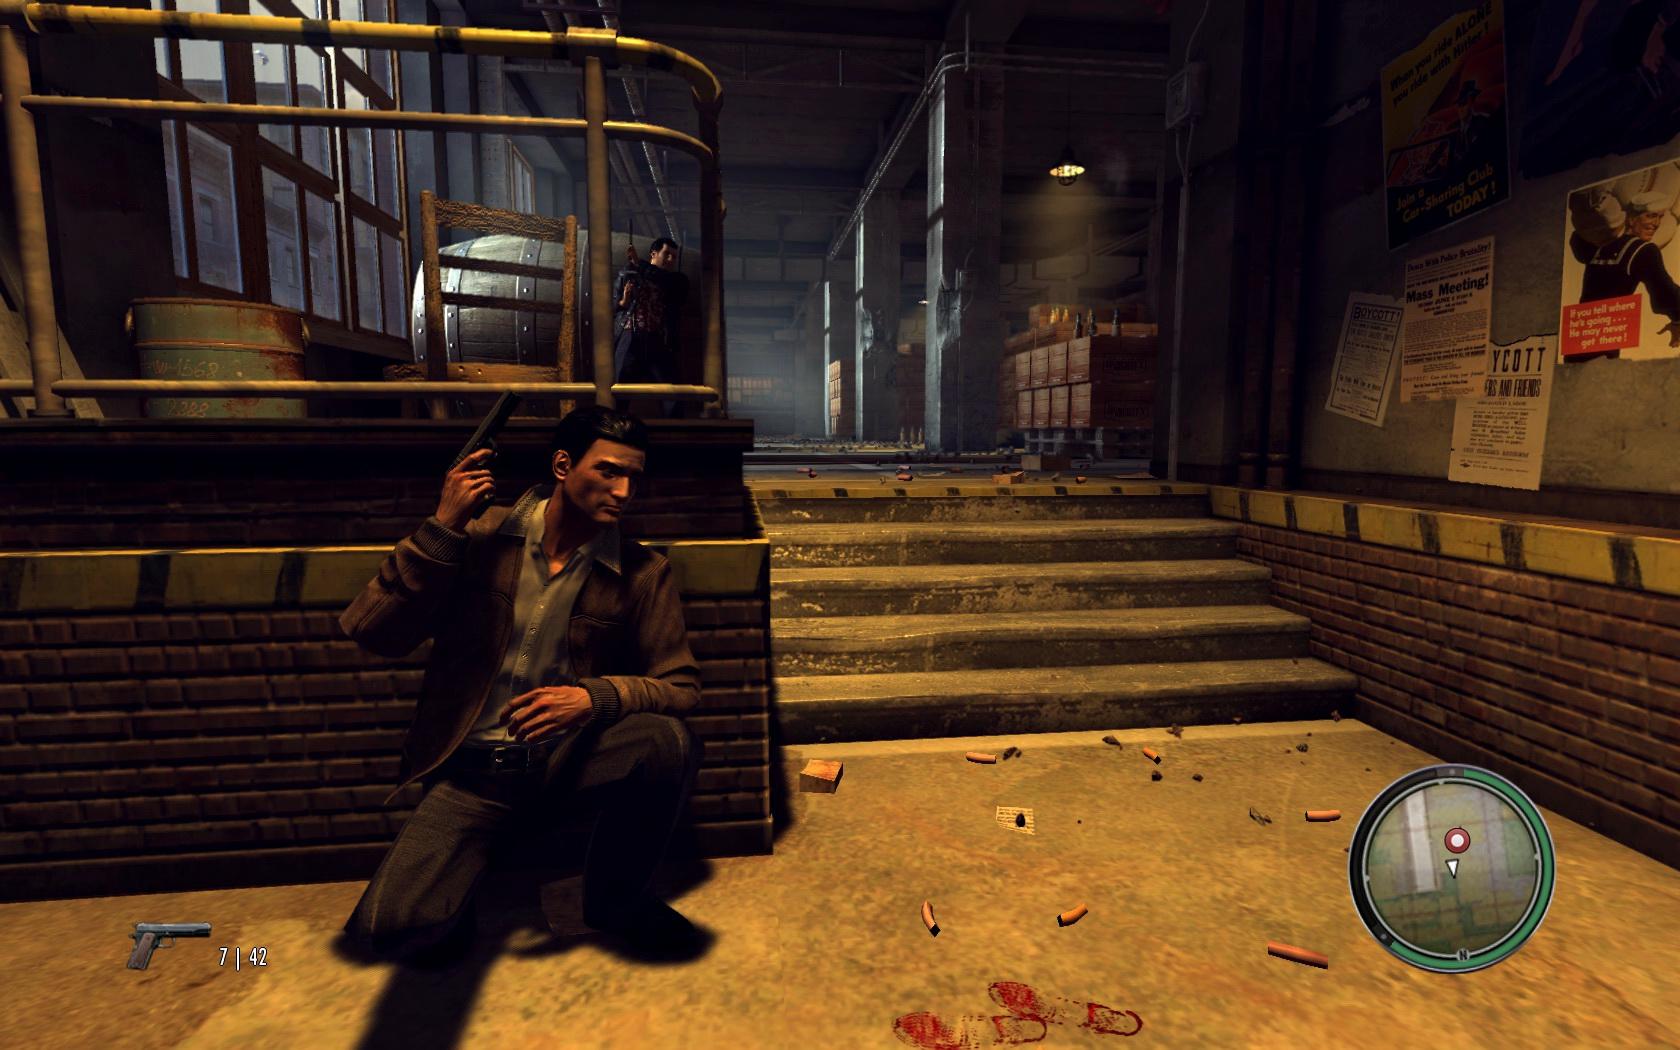 картинки мафии из игр